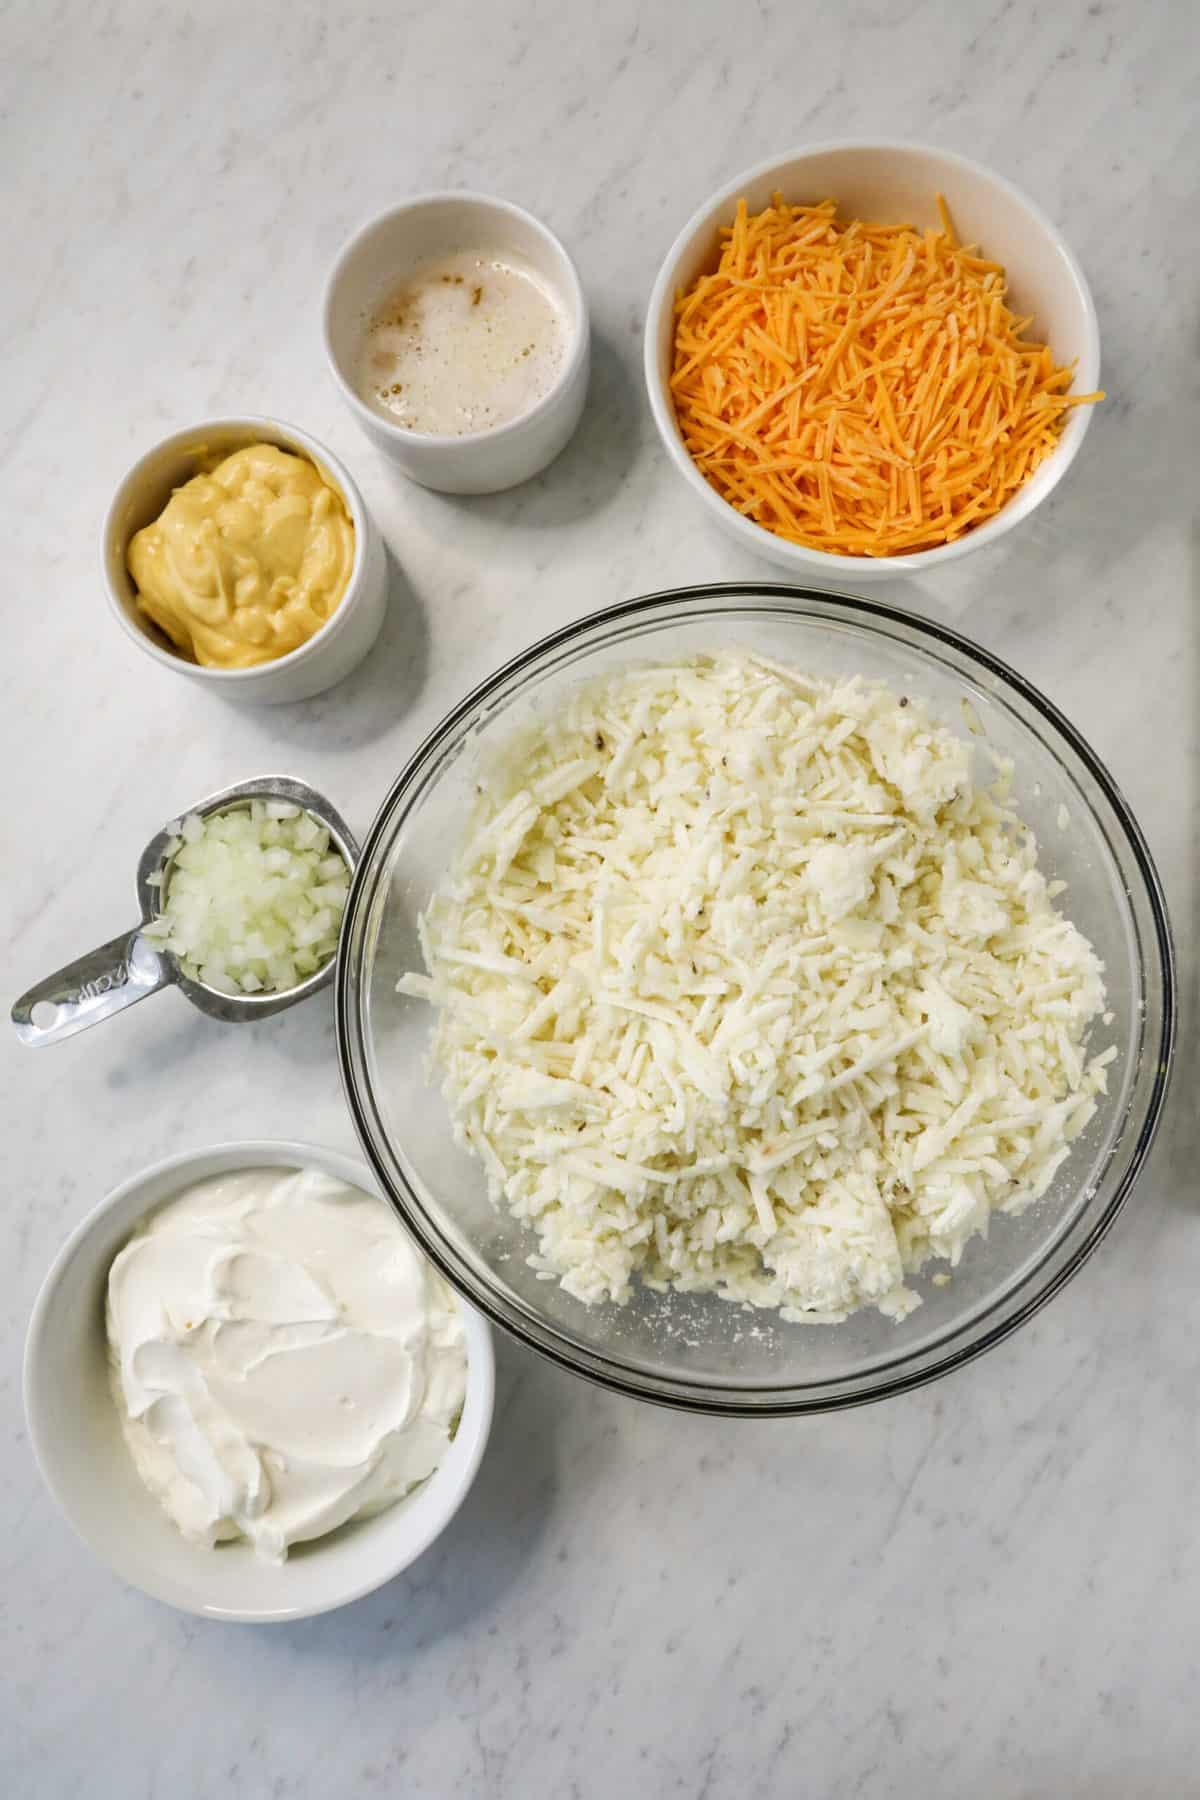 ingredients to make hashbrown casserole